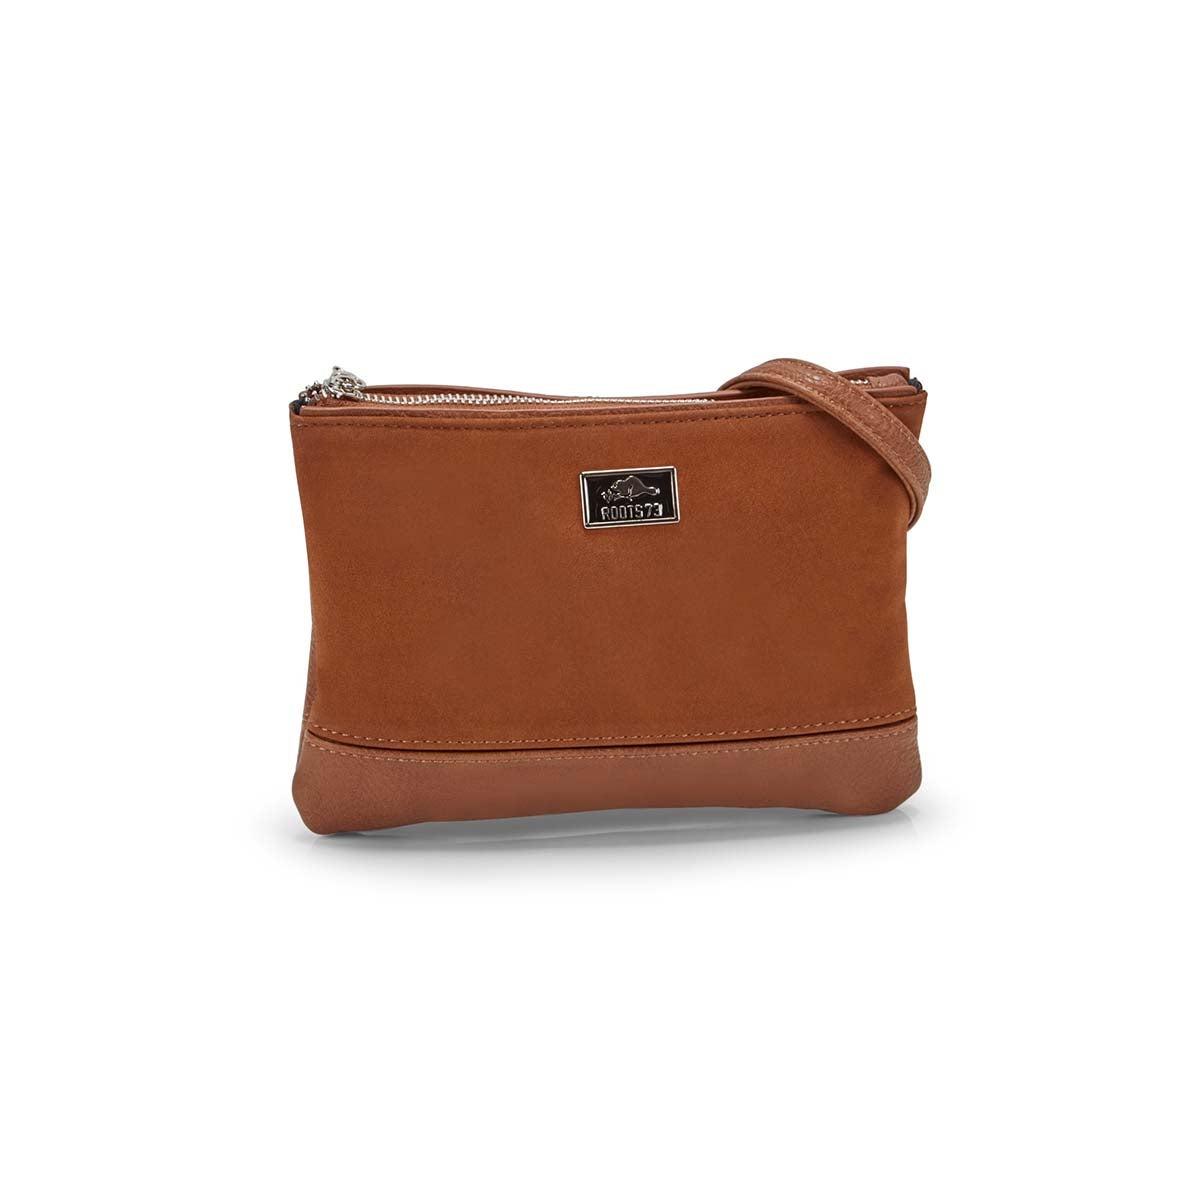 Women's R5357 cognac crossbody bag